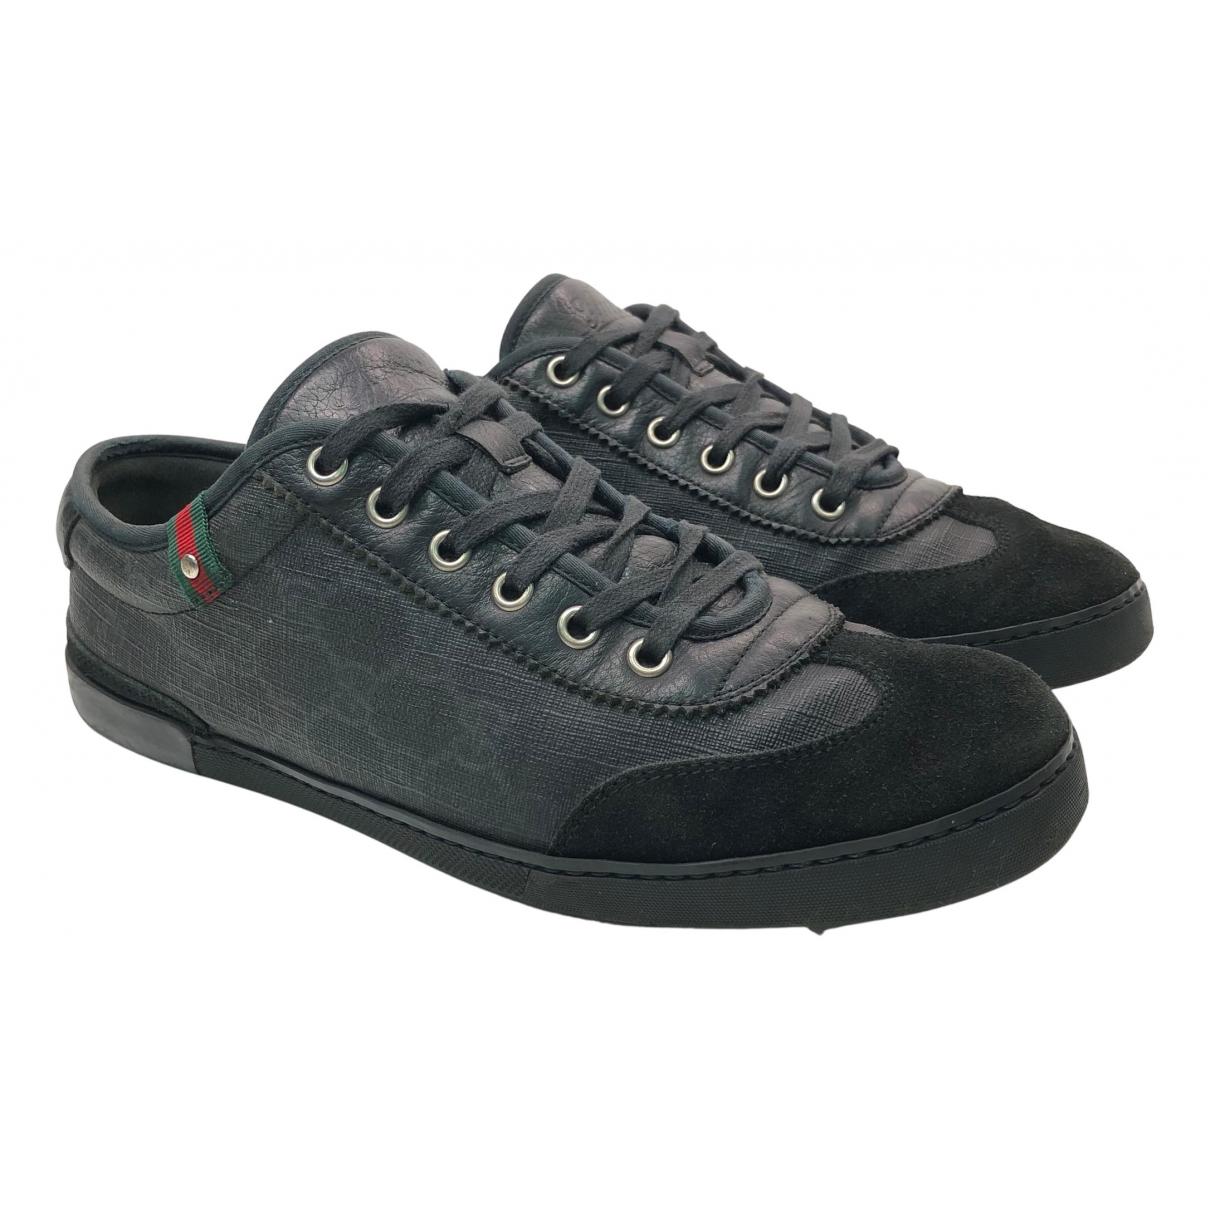 Gucci \N Sneakers in  Schwarz Leinen